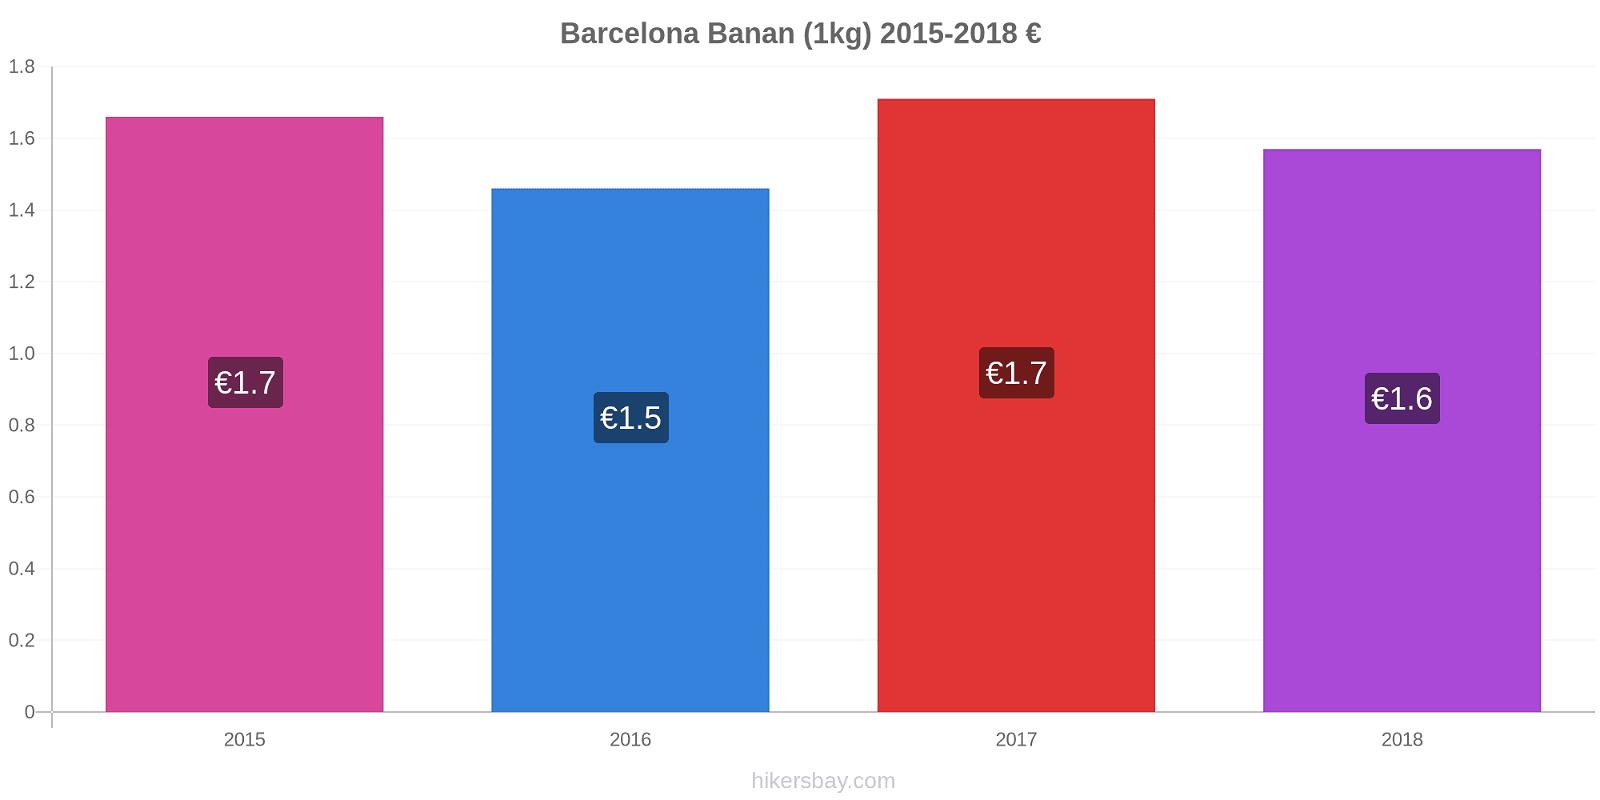 Barcelona prisendringer Banan (1kg) hikersbay.com